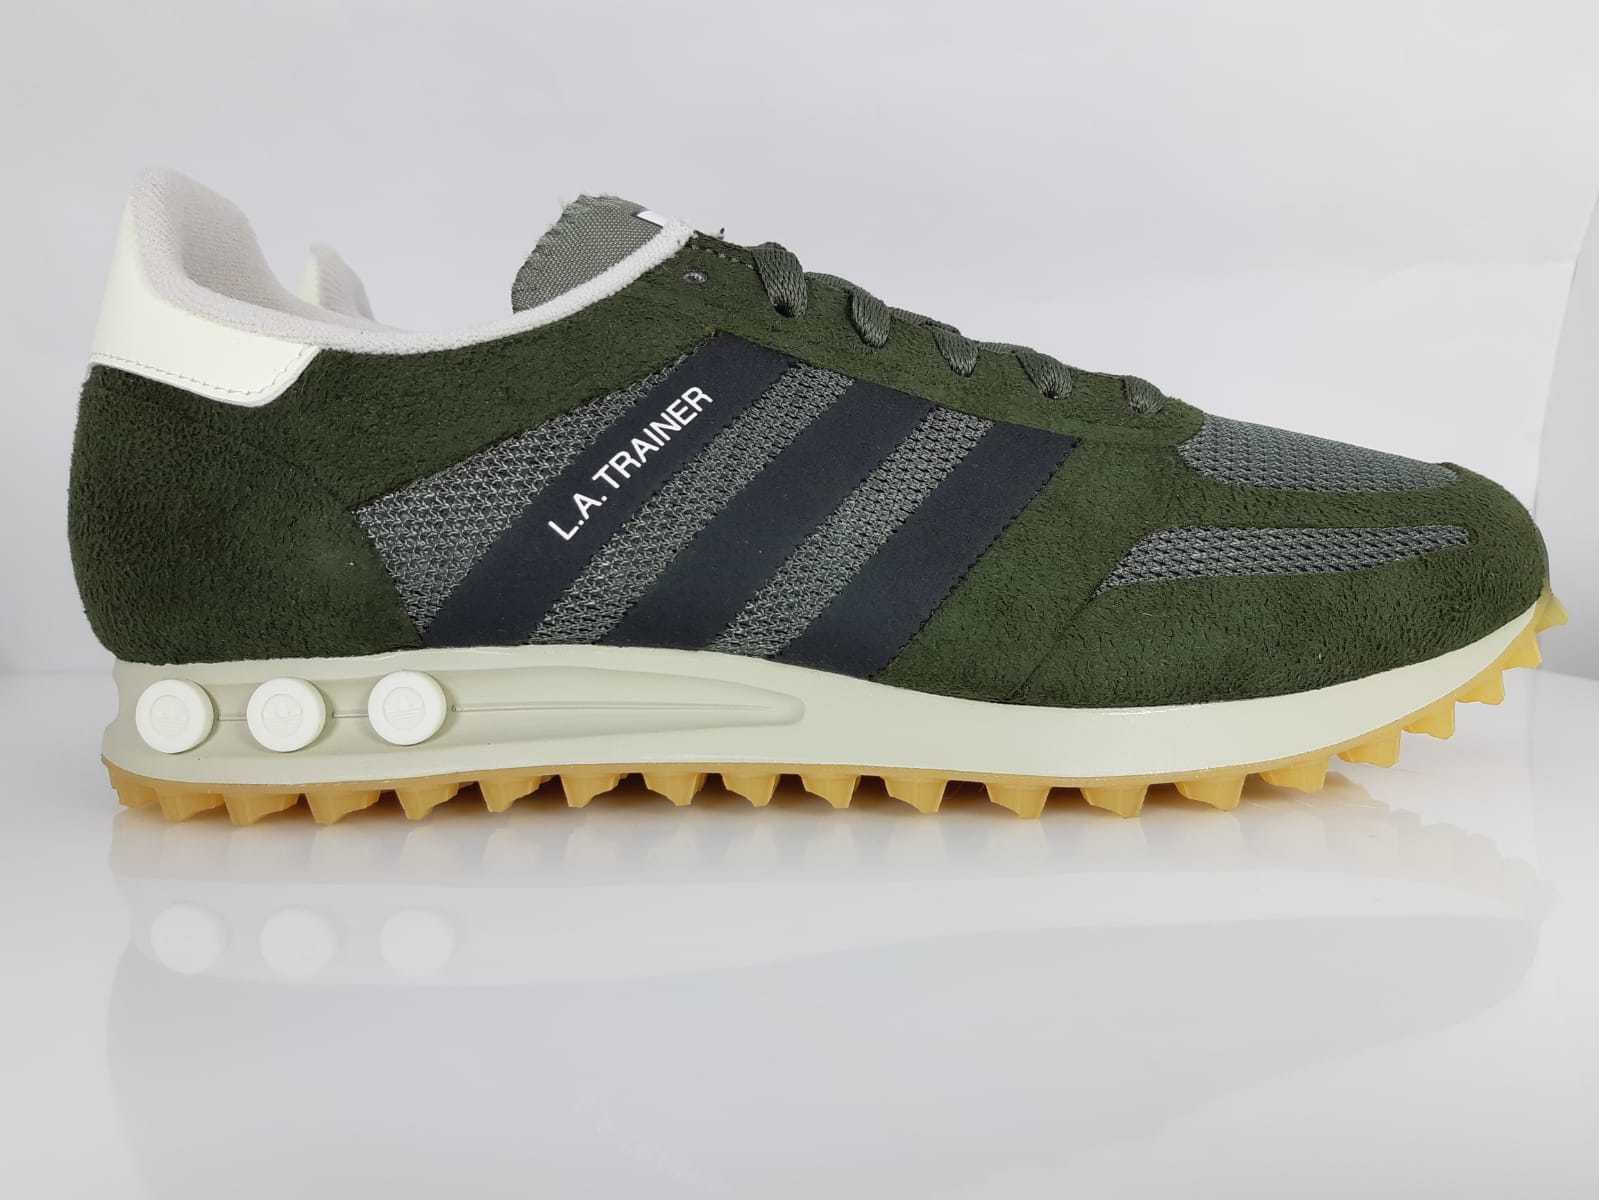 Cm Trainer N39 24 Adidas Artby9320 13 5rlj34a Sneakers Scarpe La odBrxeWC